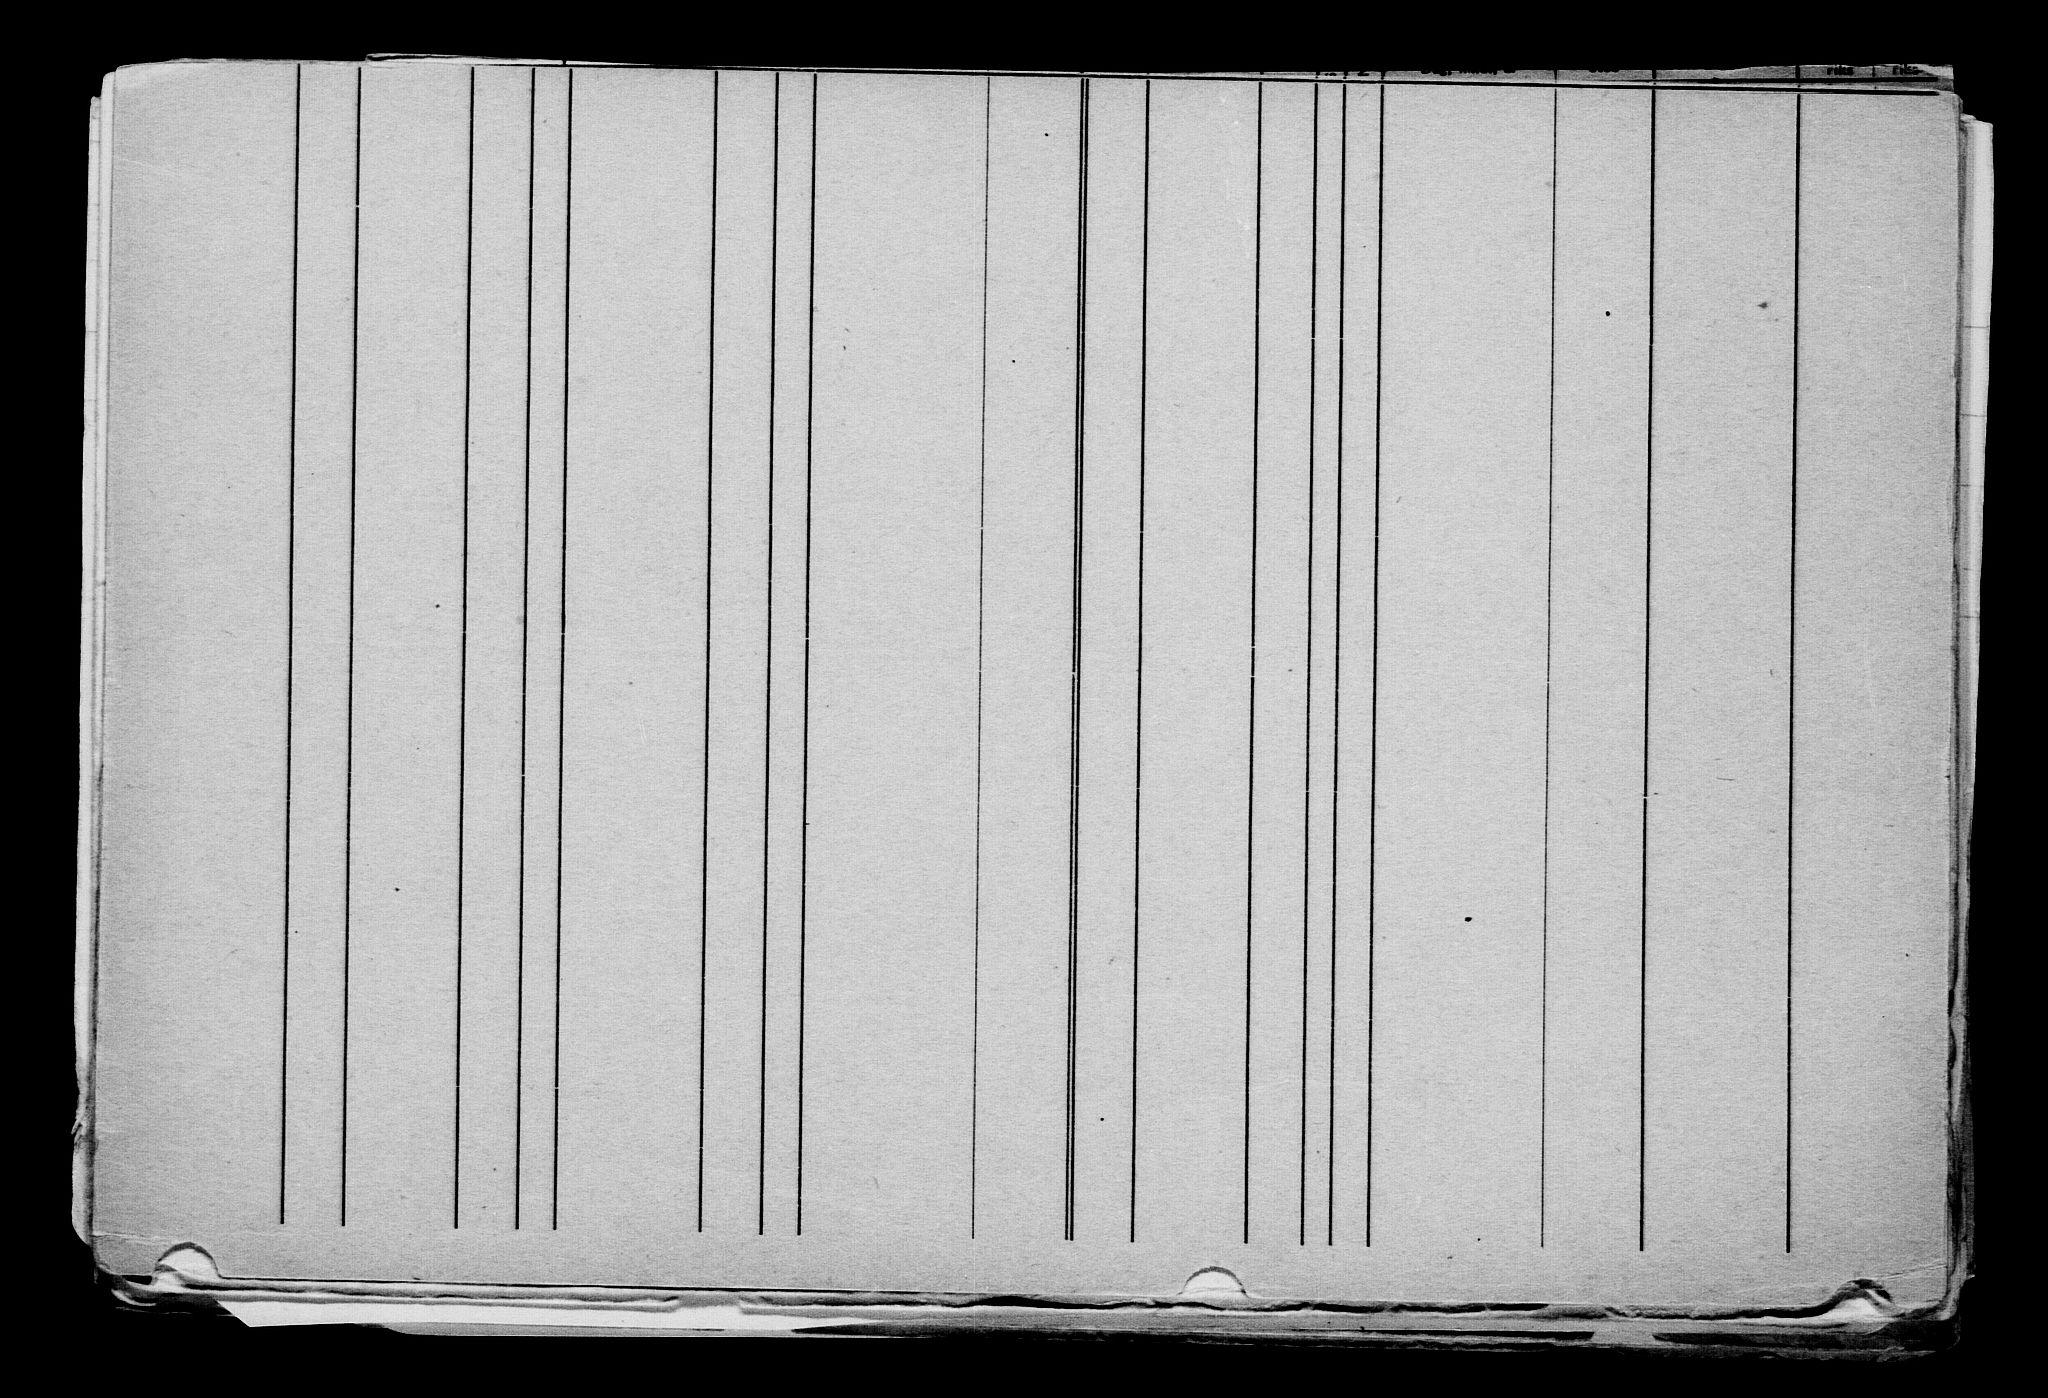 RA, Direktoratet for sjømenn, G/Gb/L0038: Hovedkort, 1900-1901, s. 375